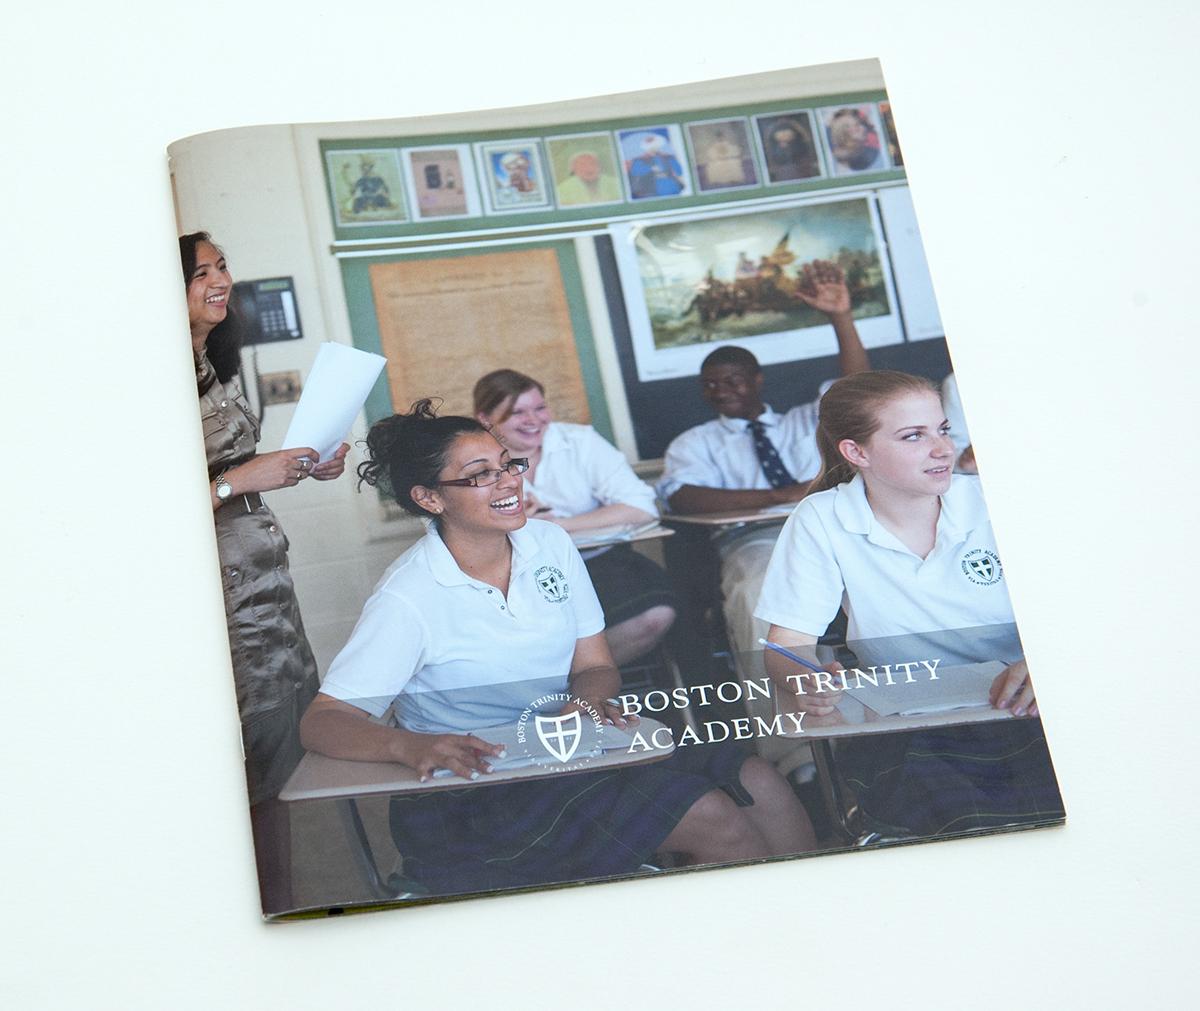 Boston Trinity Academy viewbook